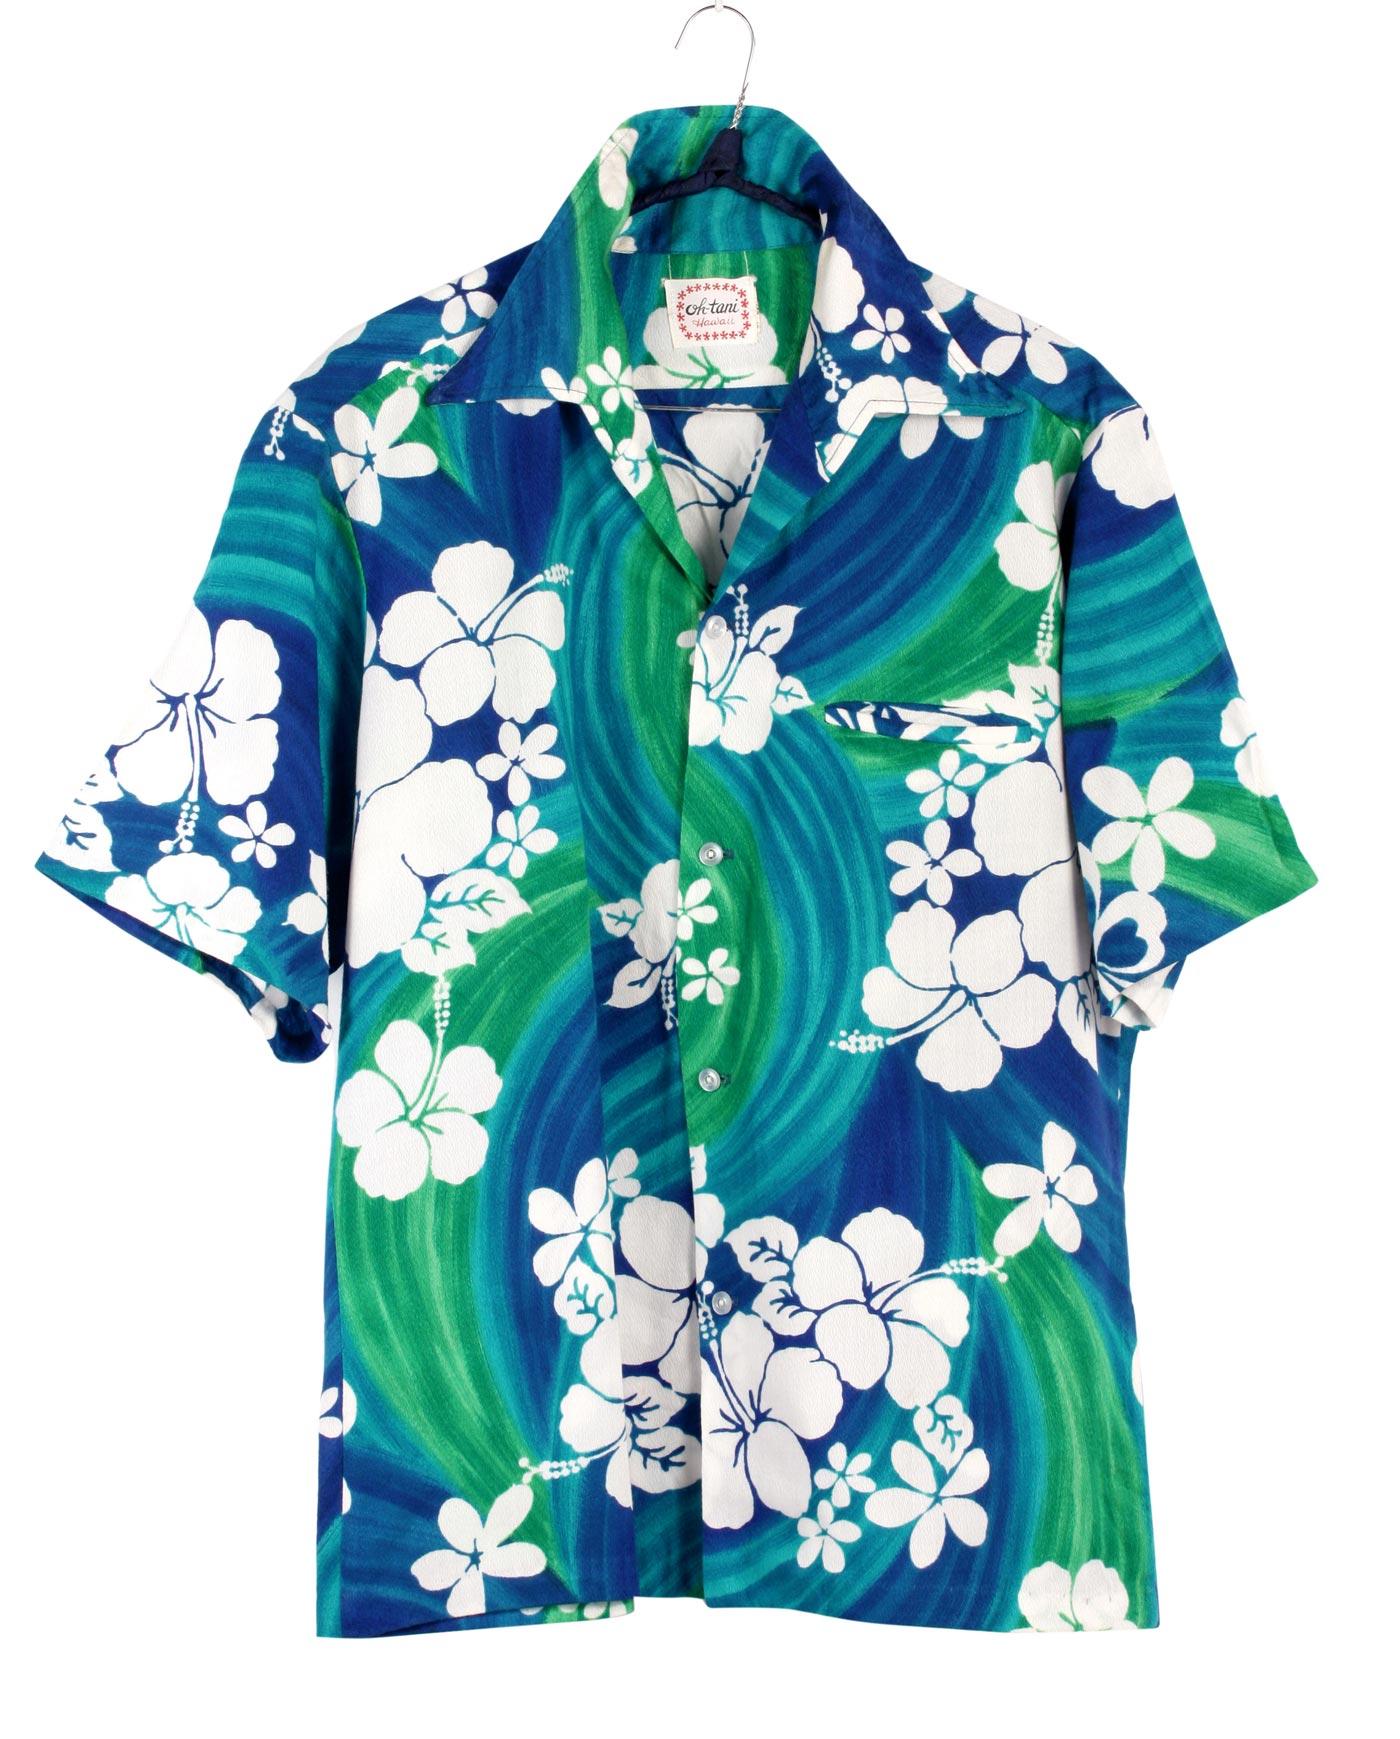 Camicia o Cabana Ragazza Hawaiano Ibisco Blu